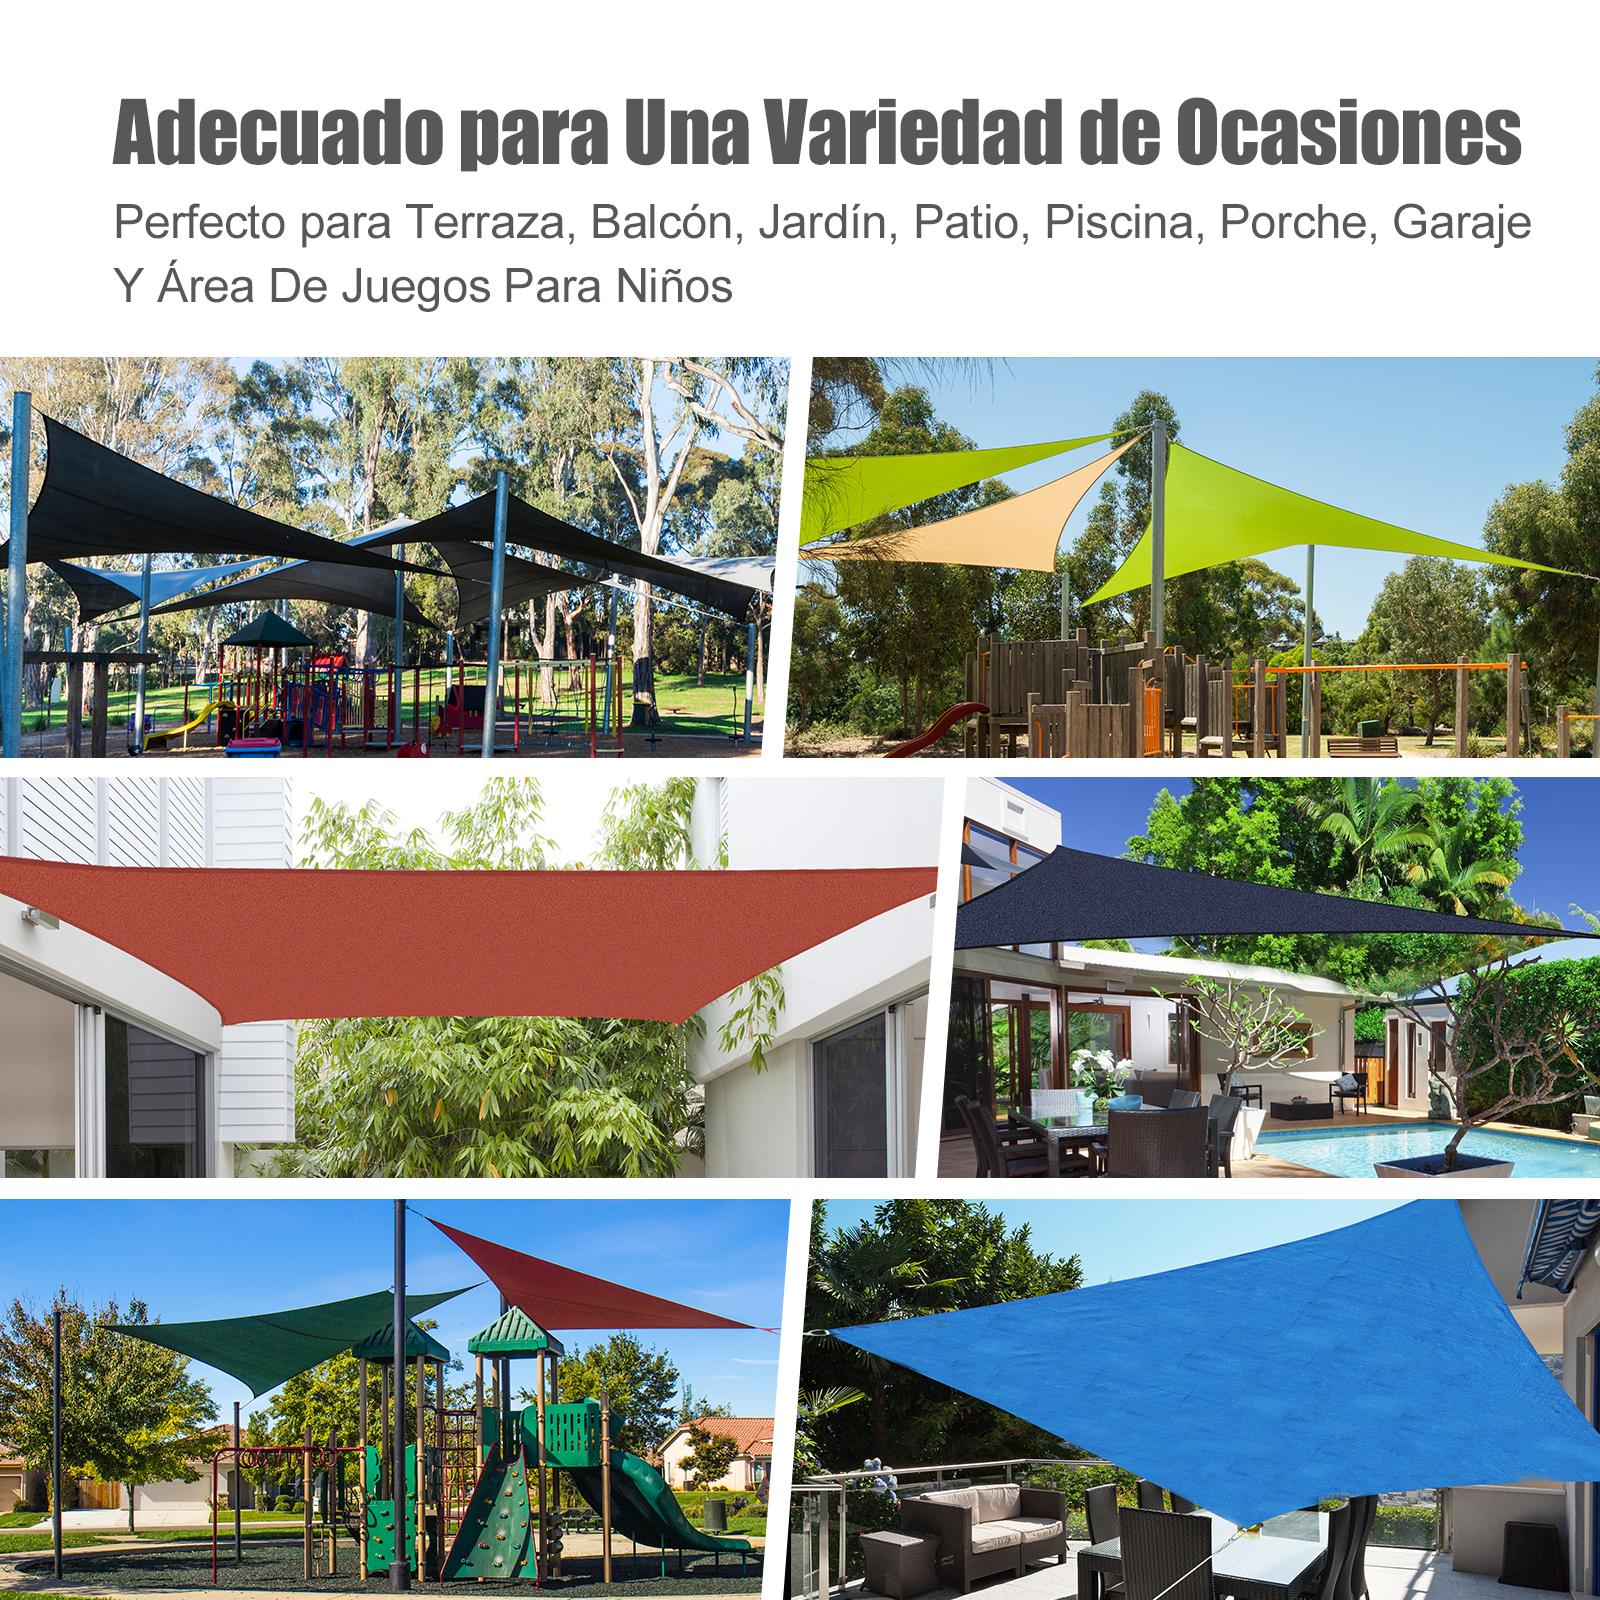 Toldo-Vela-Sombrilla-Parasol-Triangulo-Tejido-de-Poliester-185-g-m-Jardin-Playa miniatura 14